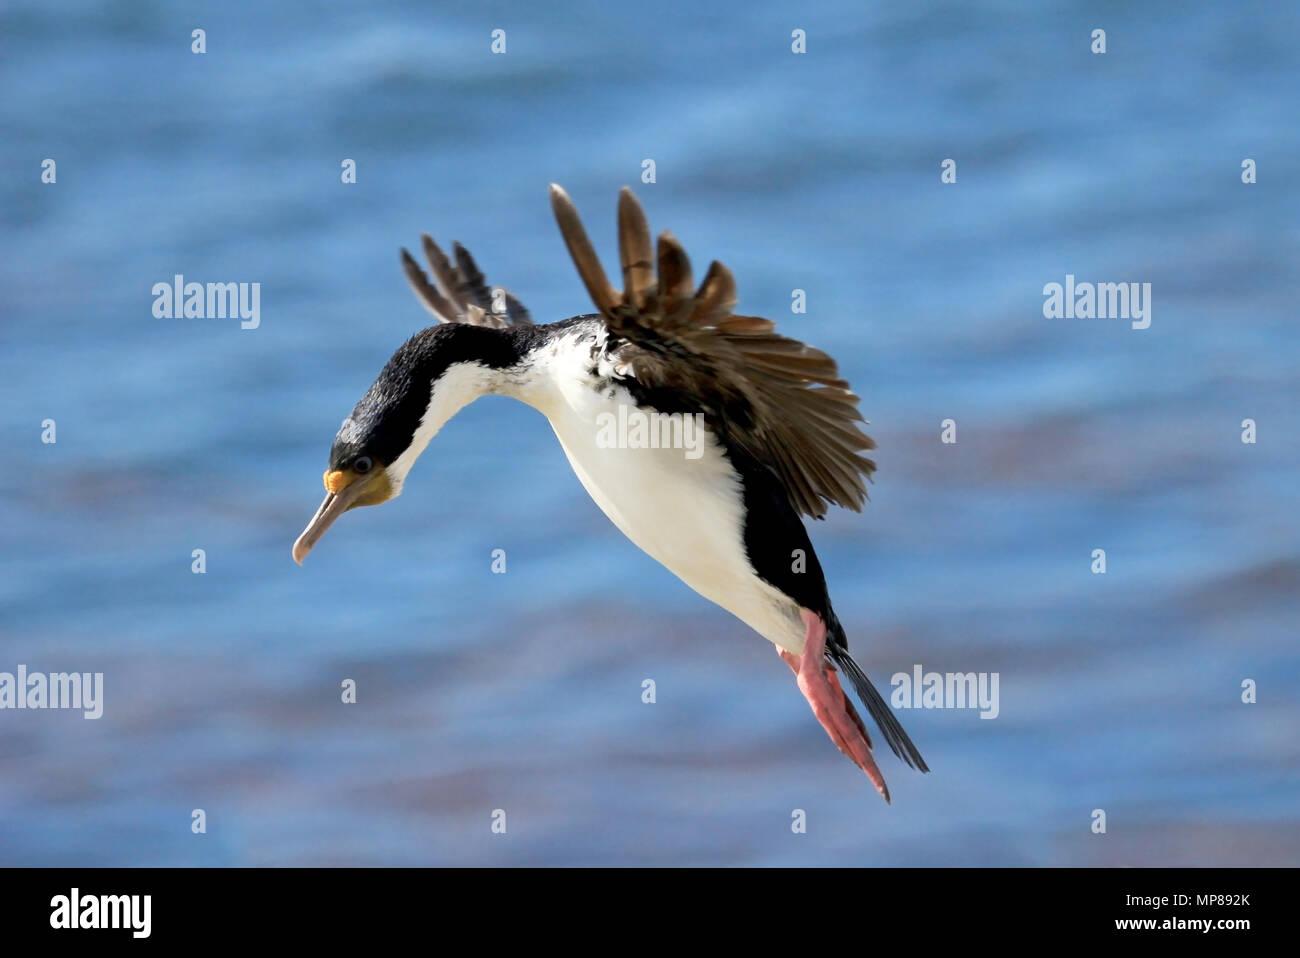 Imperial Shag Cormorant, phalacrocorax atriceps, Falkland Islands - Stock Image